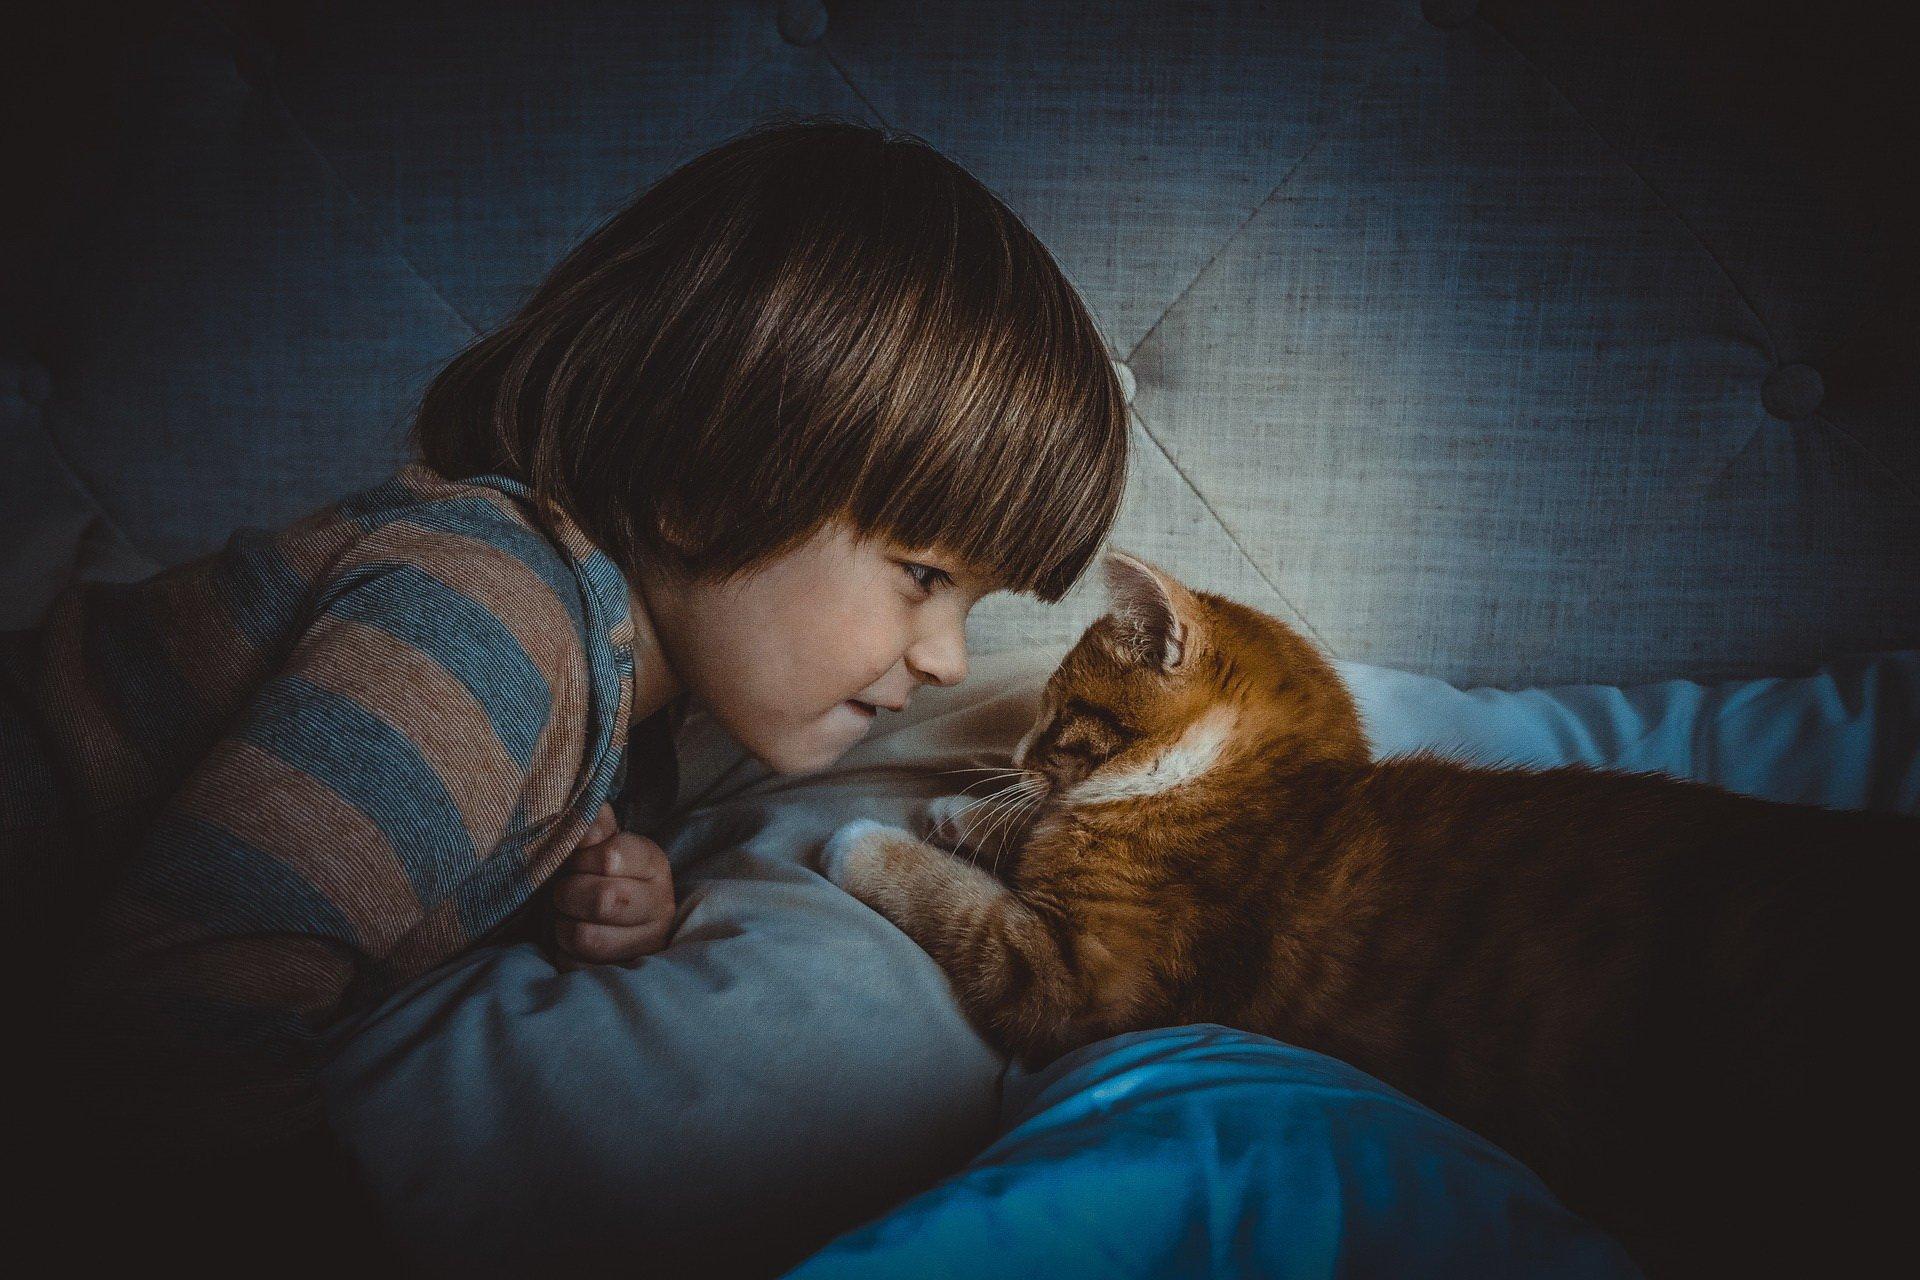 Agresywny chłopczyk z kotem